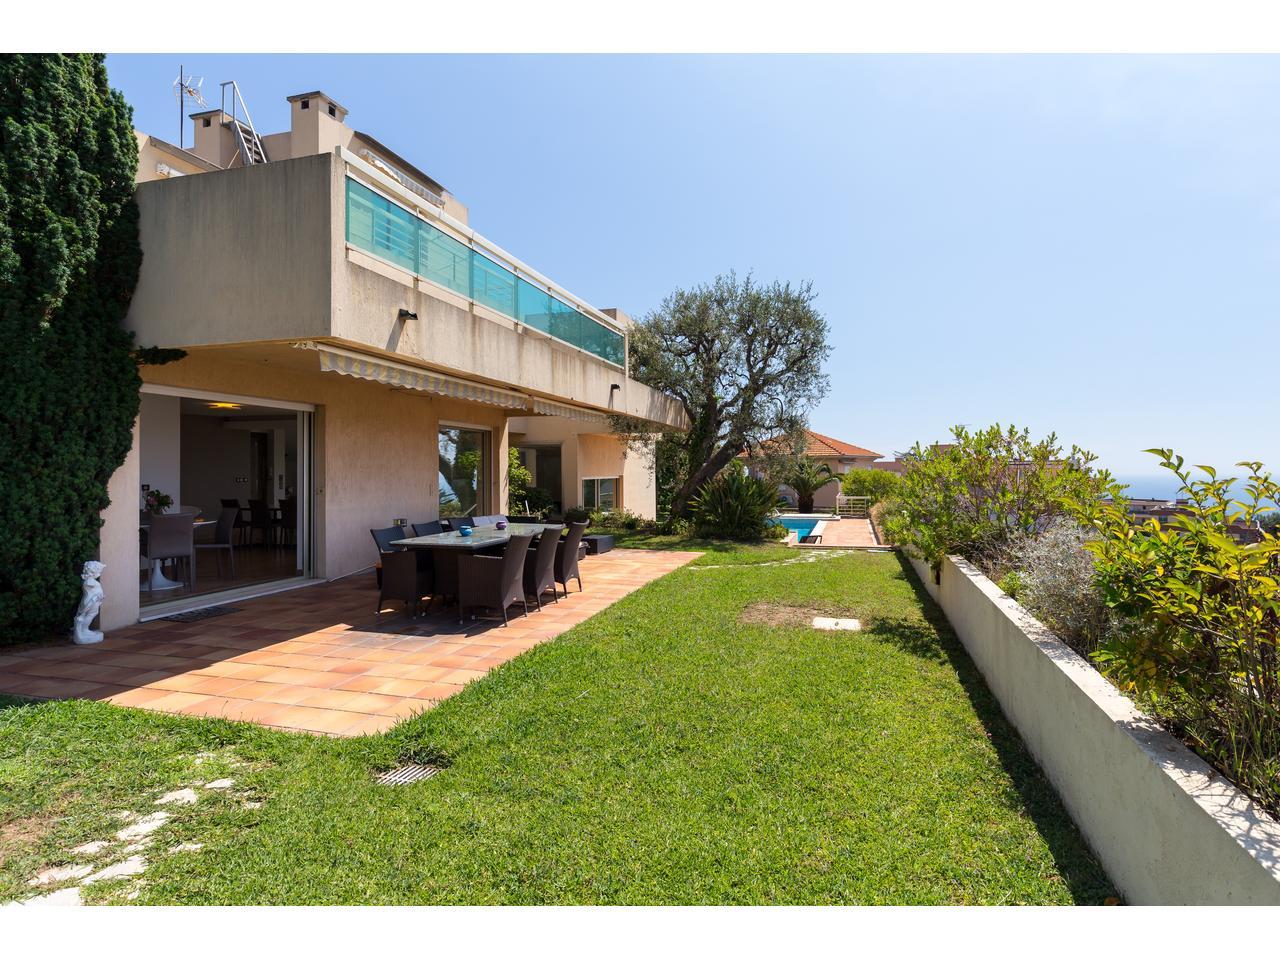 Maison Californienne Nice : Immobilier nice vue mer maison vaste villa